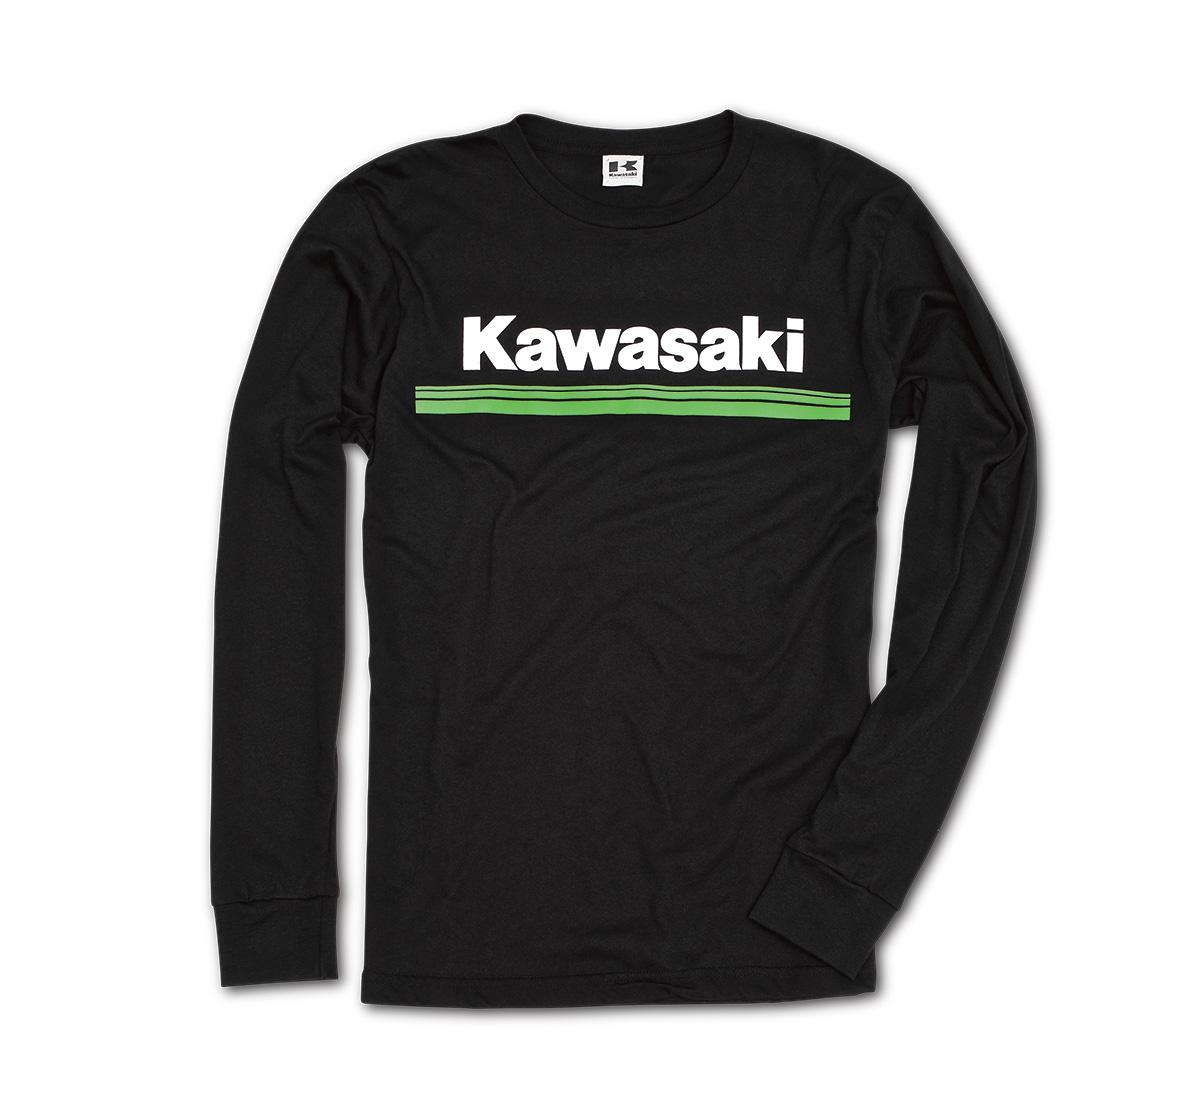 kawasaki 3 green lines long sleeve t shirt. Black Bedroom Furniture Sets. Home Design Ideas